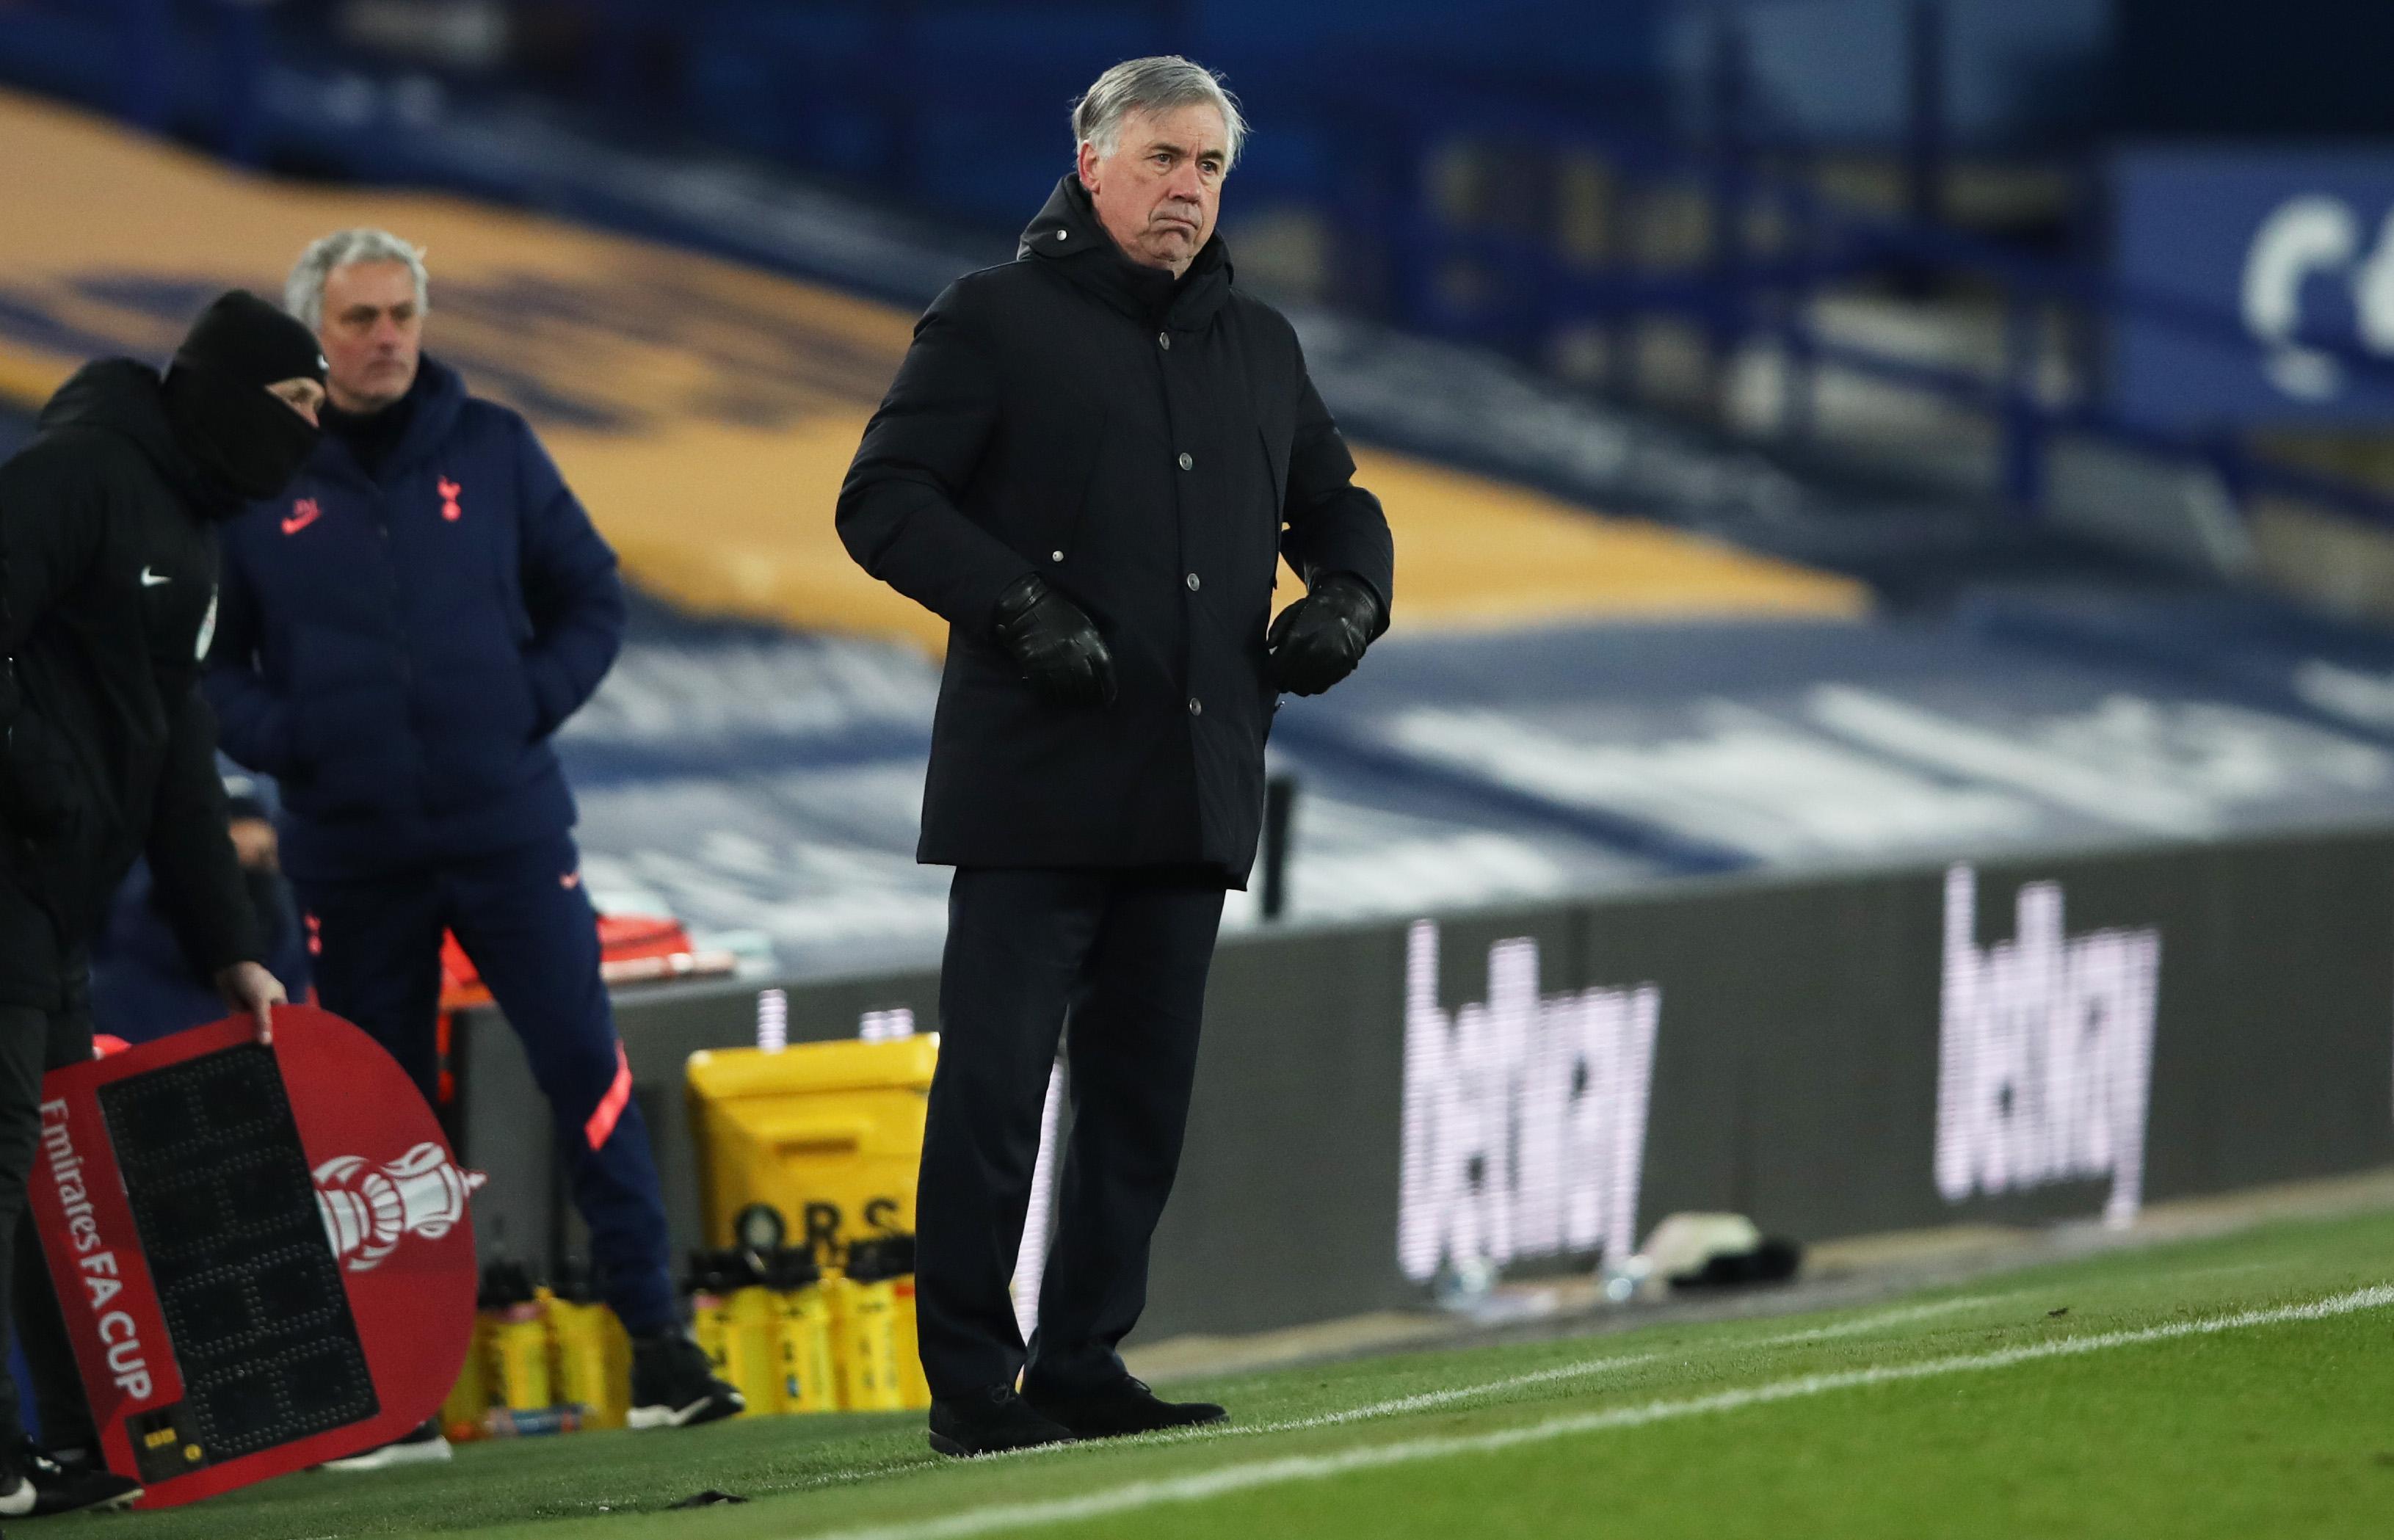 Everton v Tottenham Hotspur: The Emirates FA Cup Fifth Round